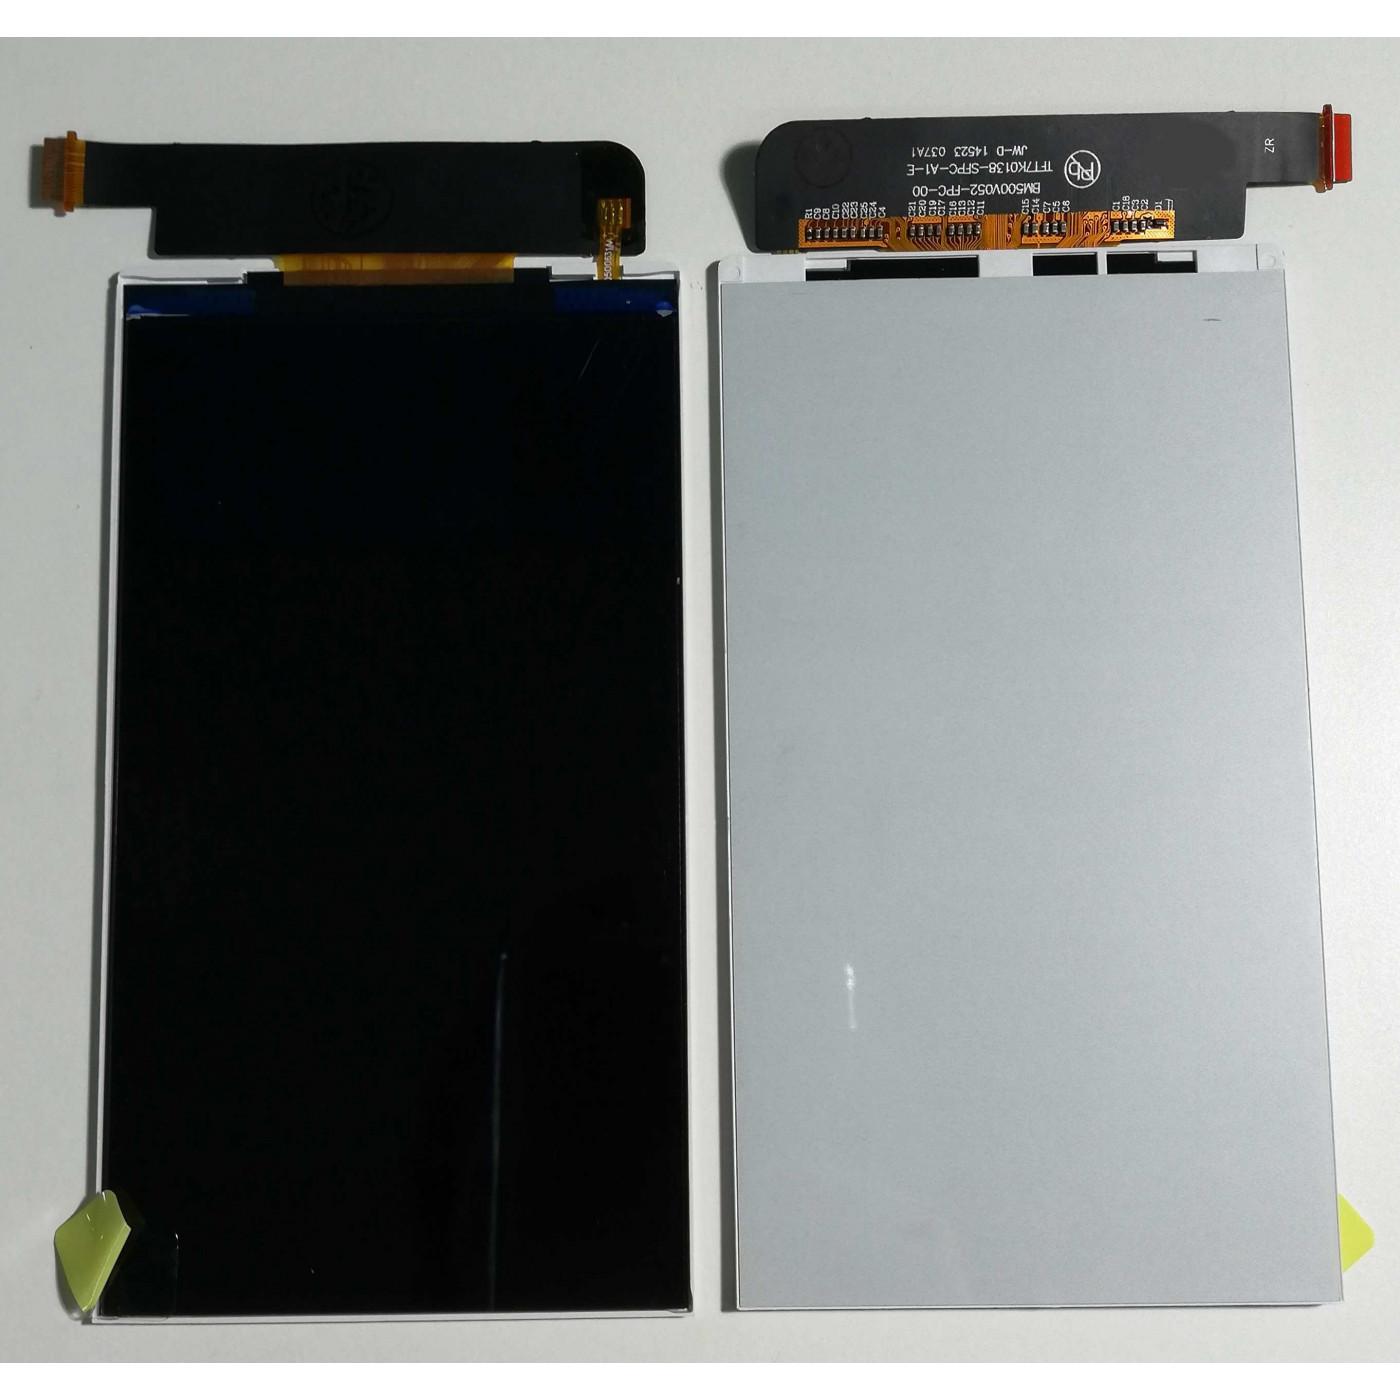 LCD DISPLAY For Sony E4 E2104 E2105 E2115 E2124 SCREEN MONITOR